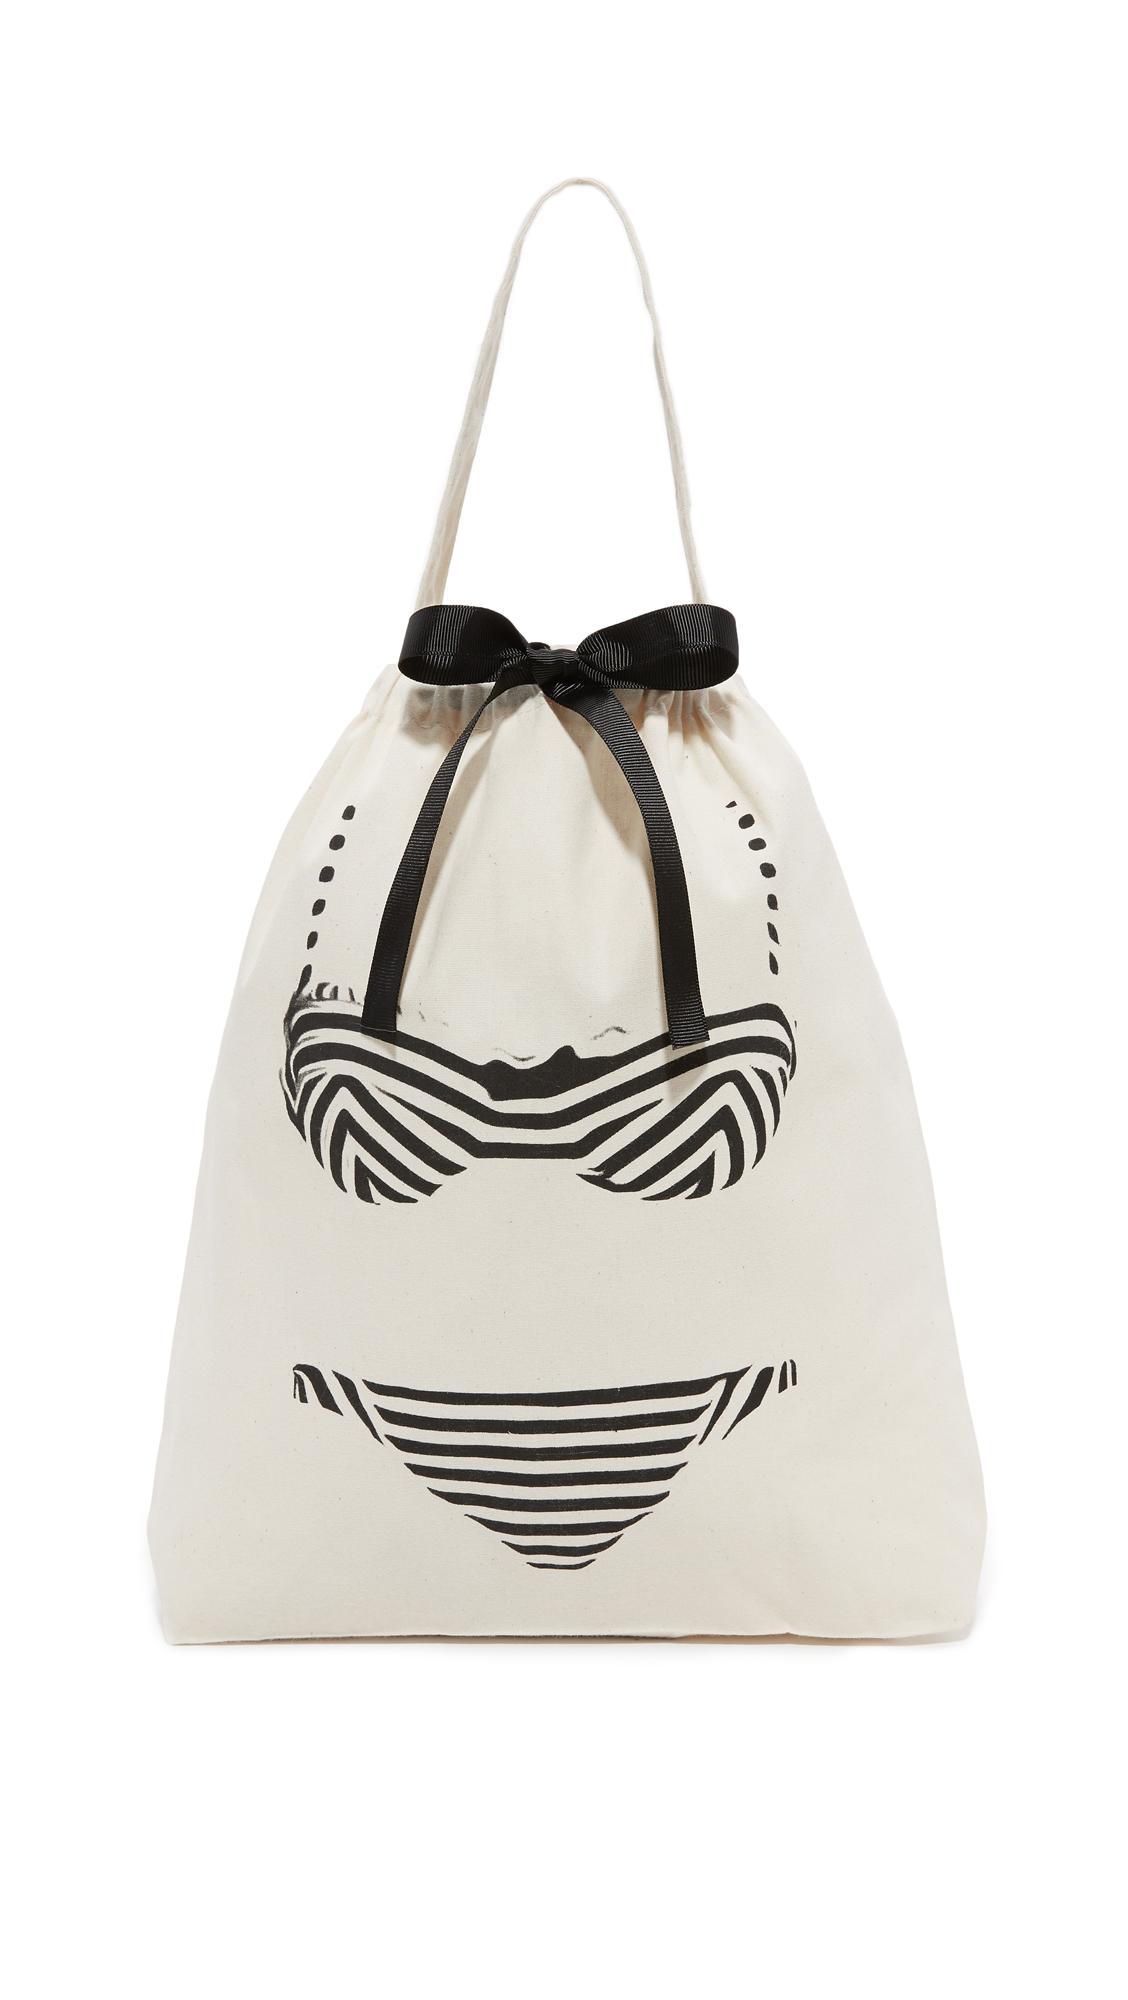 Bag-all Bikini Travel Bag - Natural/Black